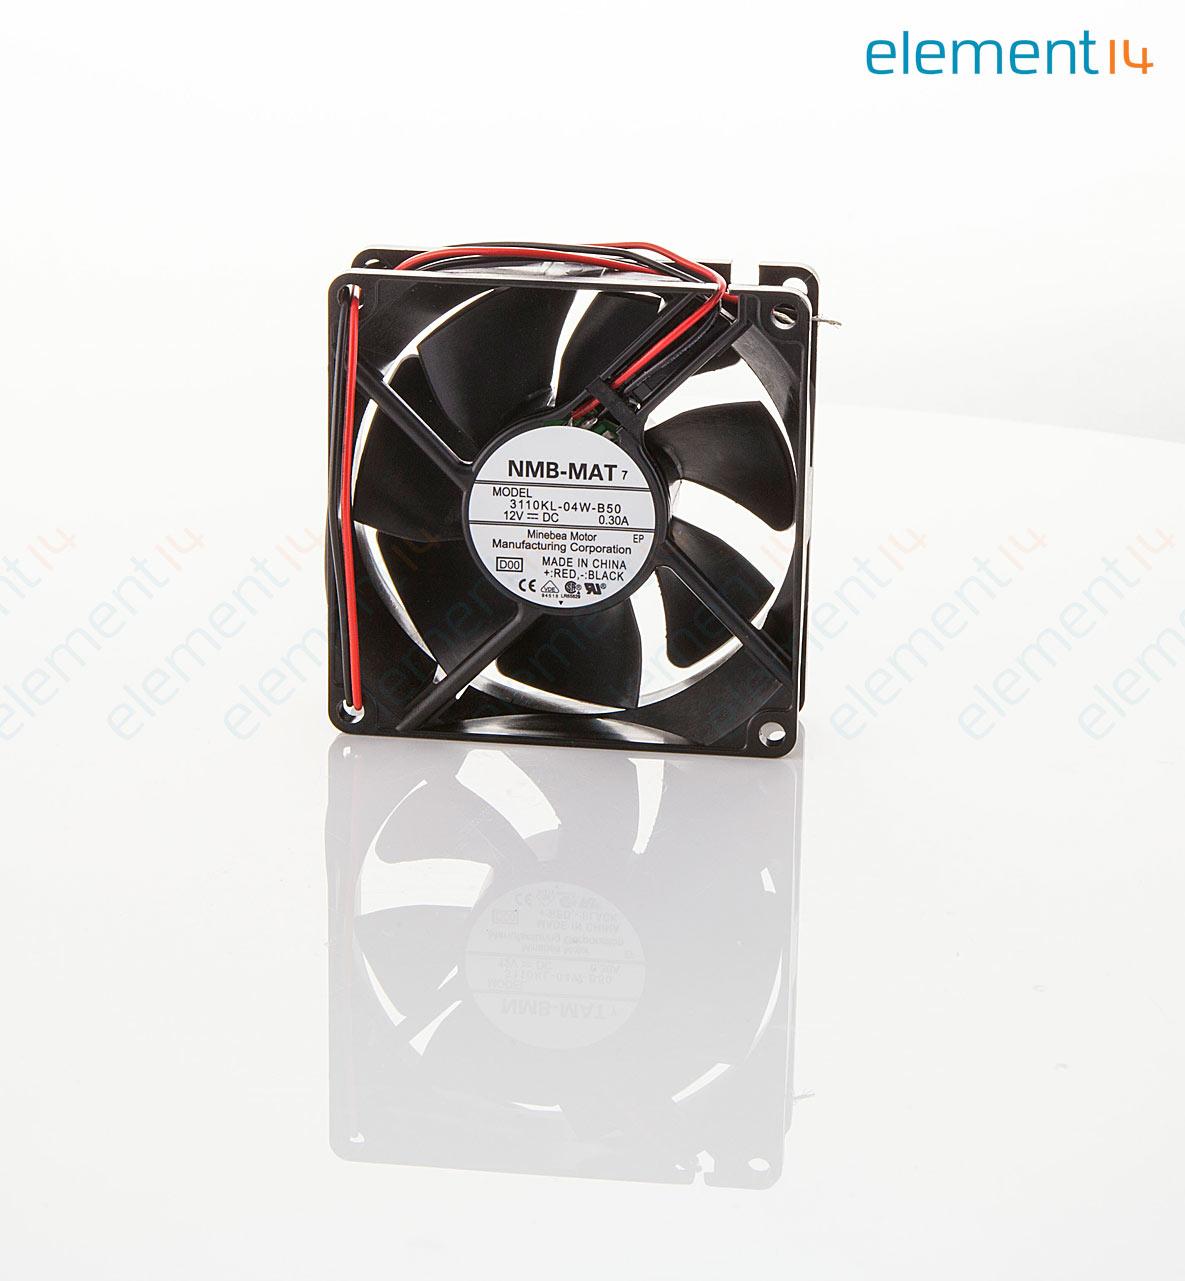 sale nmb power cooling axial mat motor servo mats fan